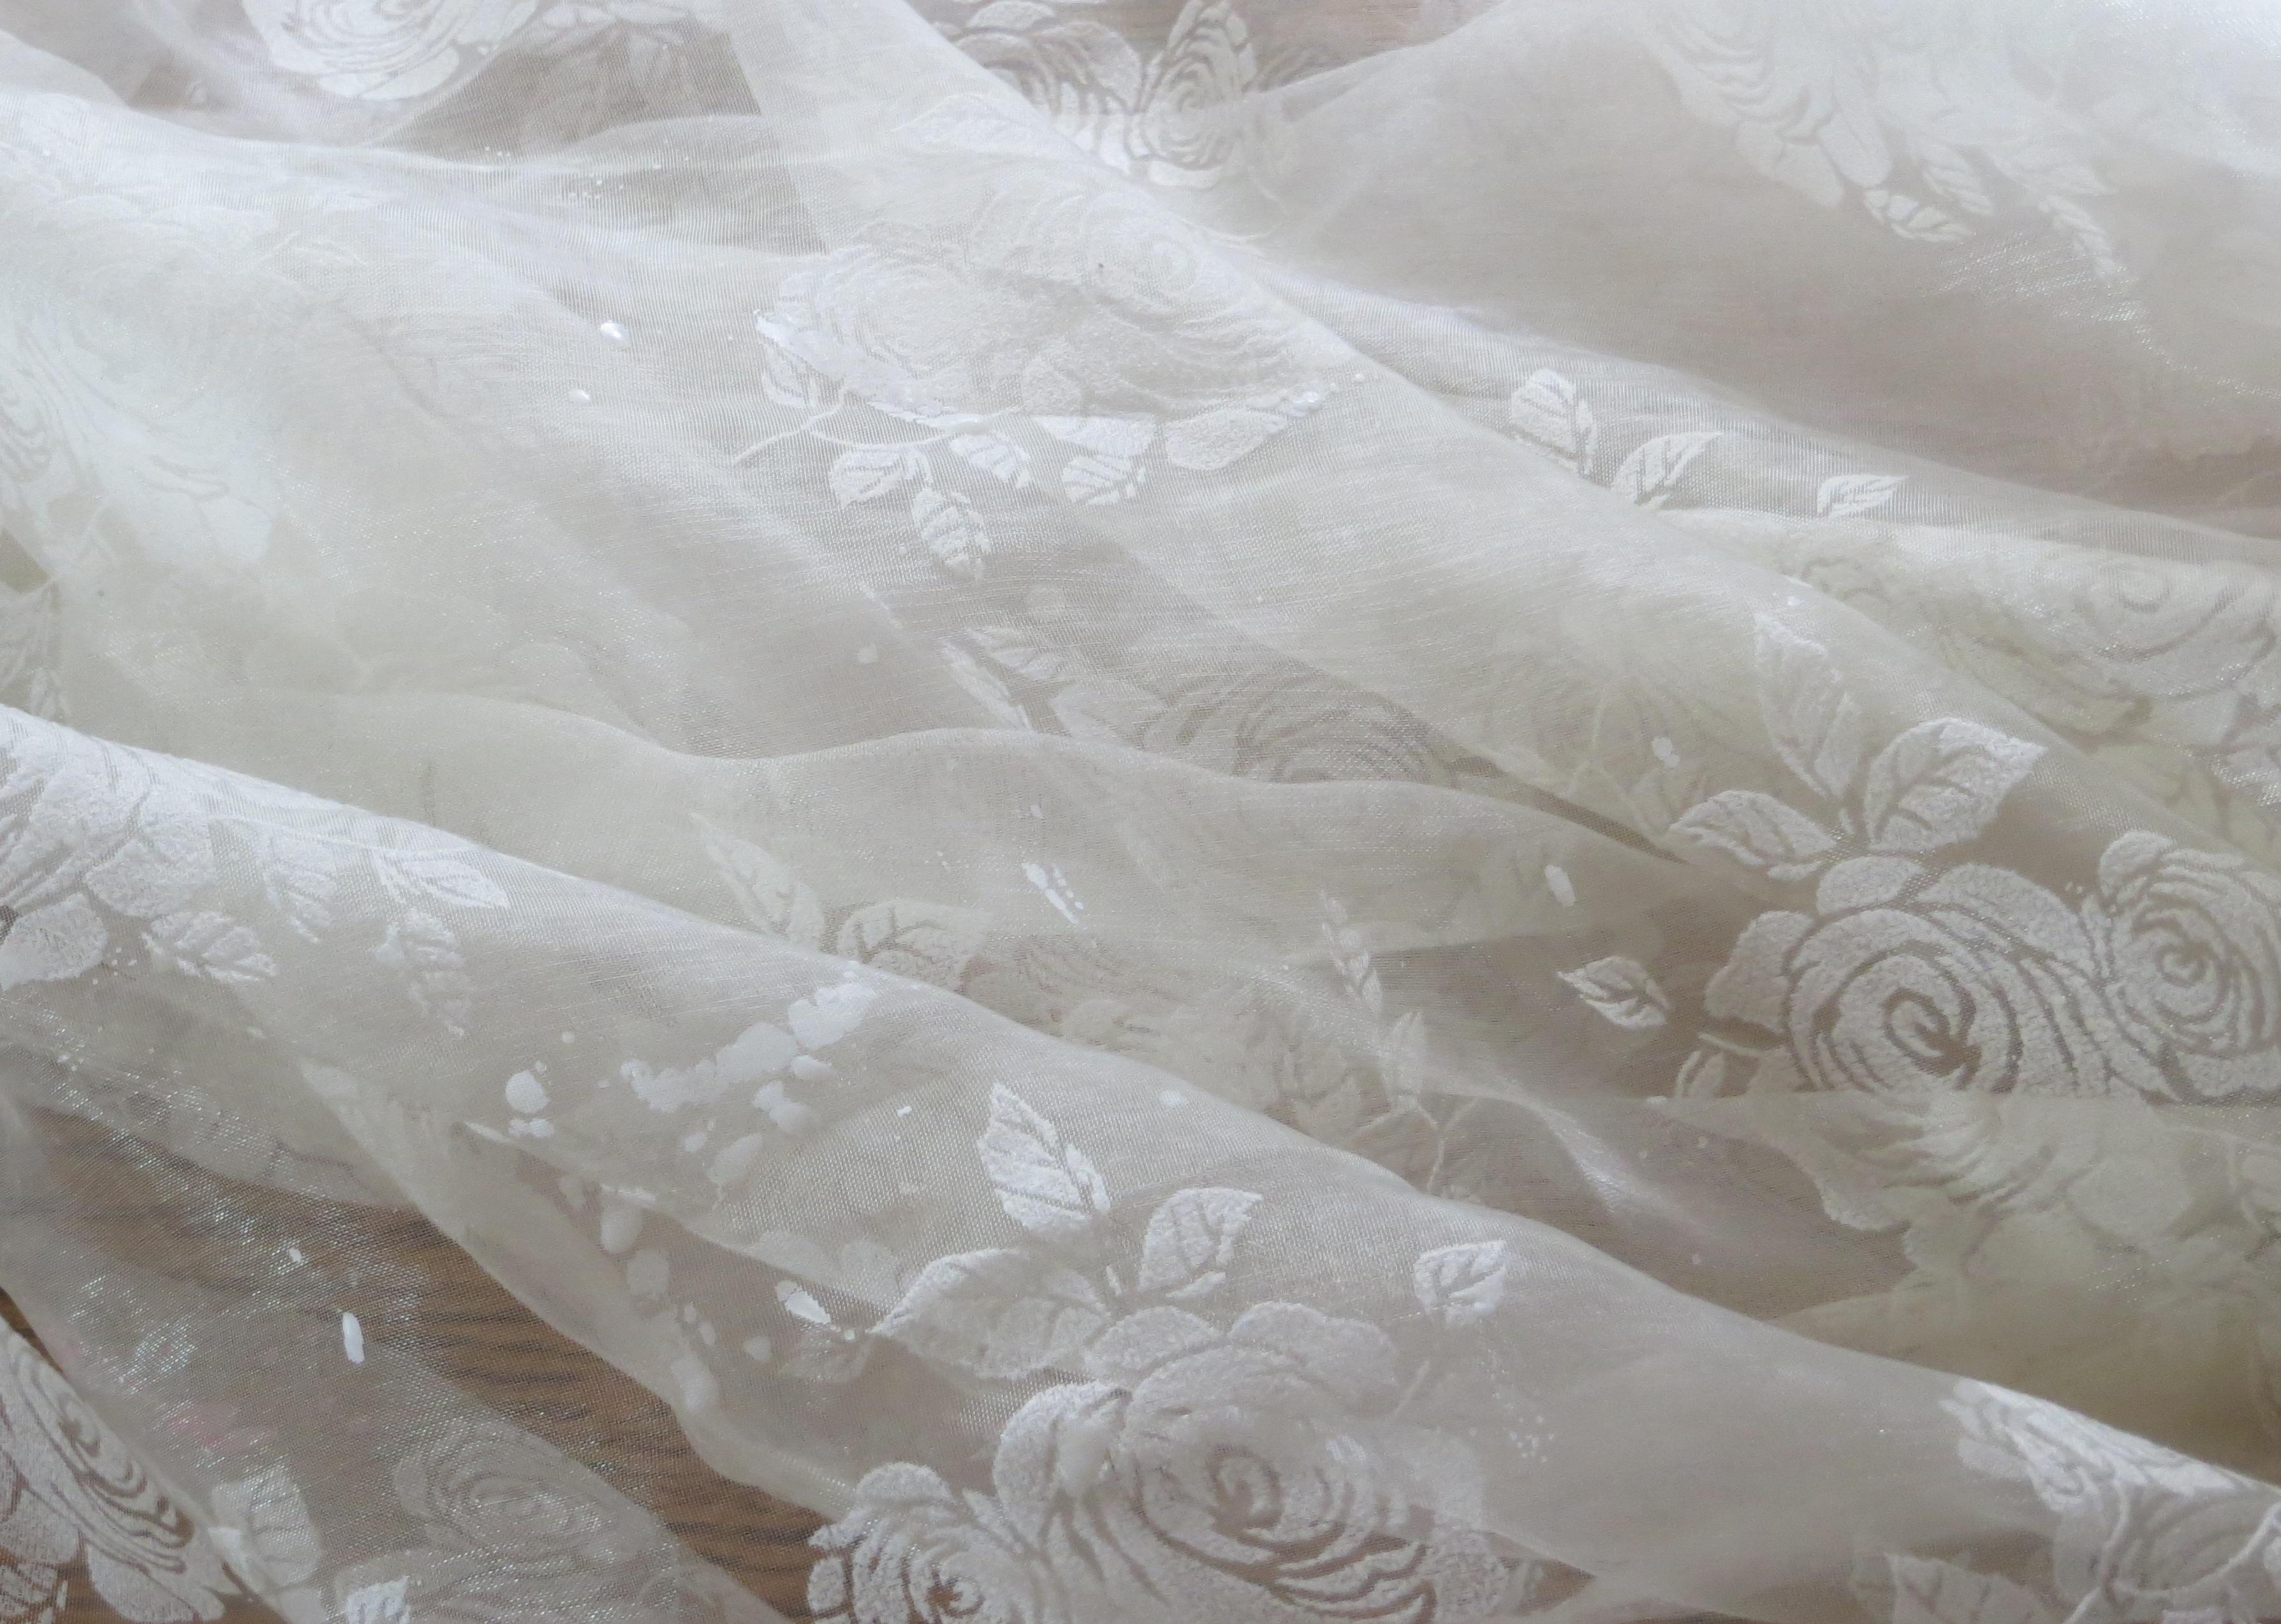 Free Images : White, Decoration, Lace, Romantic, Wedding